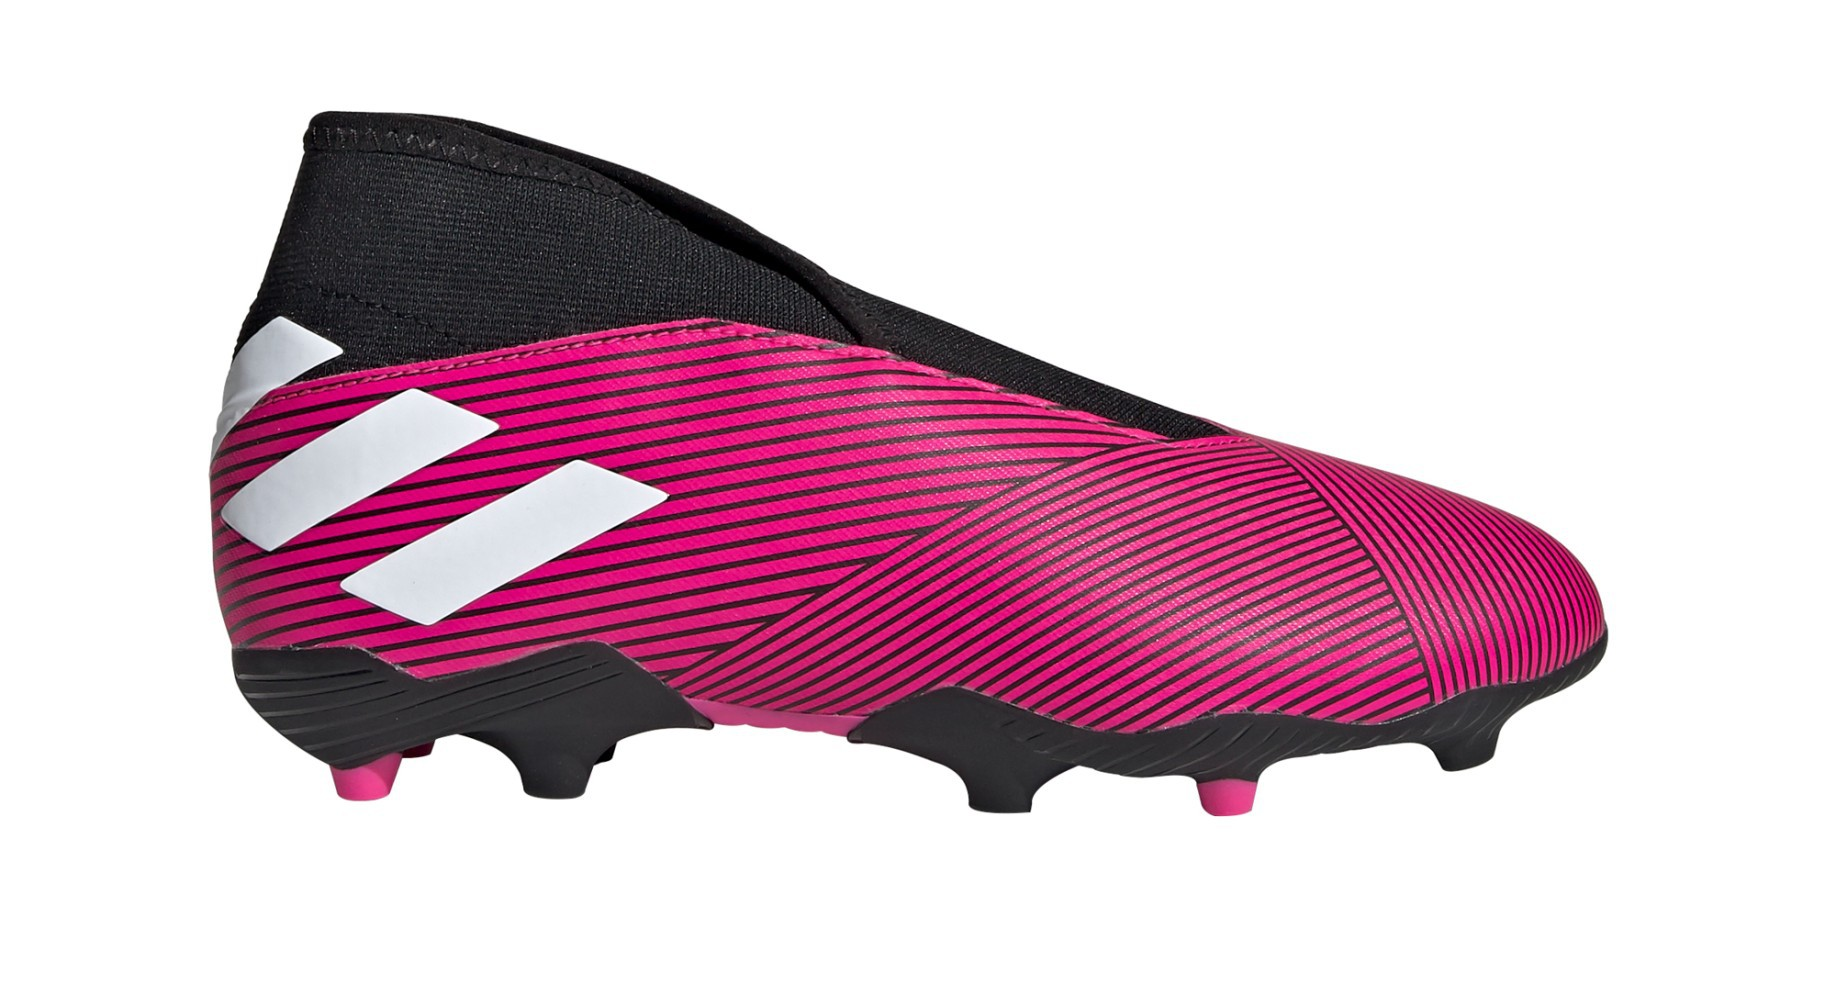 San Francisco na stopach o Najnowsza moda Football boots Adidas Nemeziz 19.3 LL FG Hardwired Pack